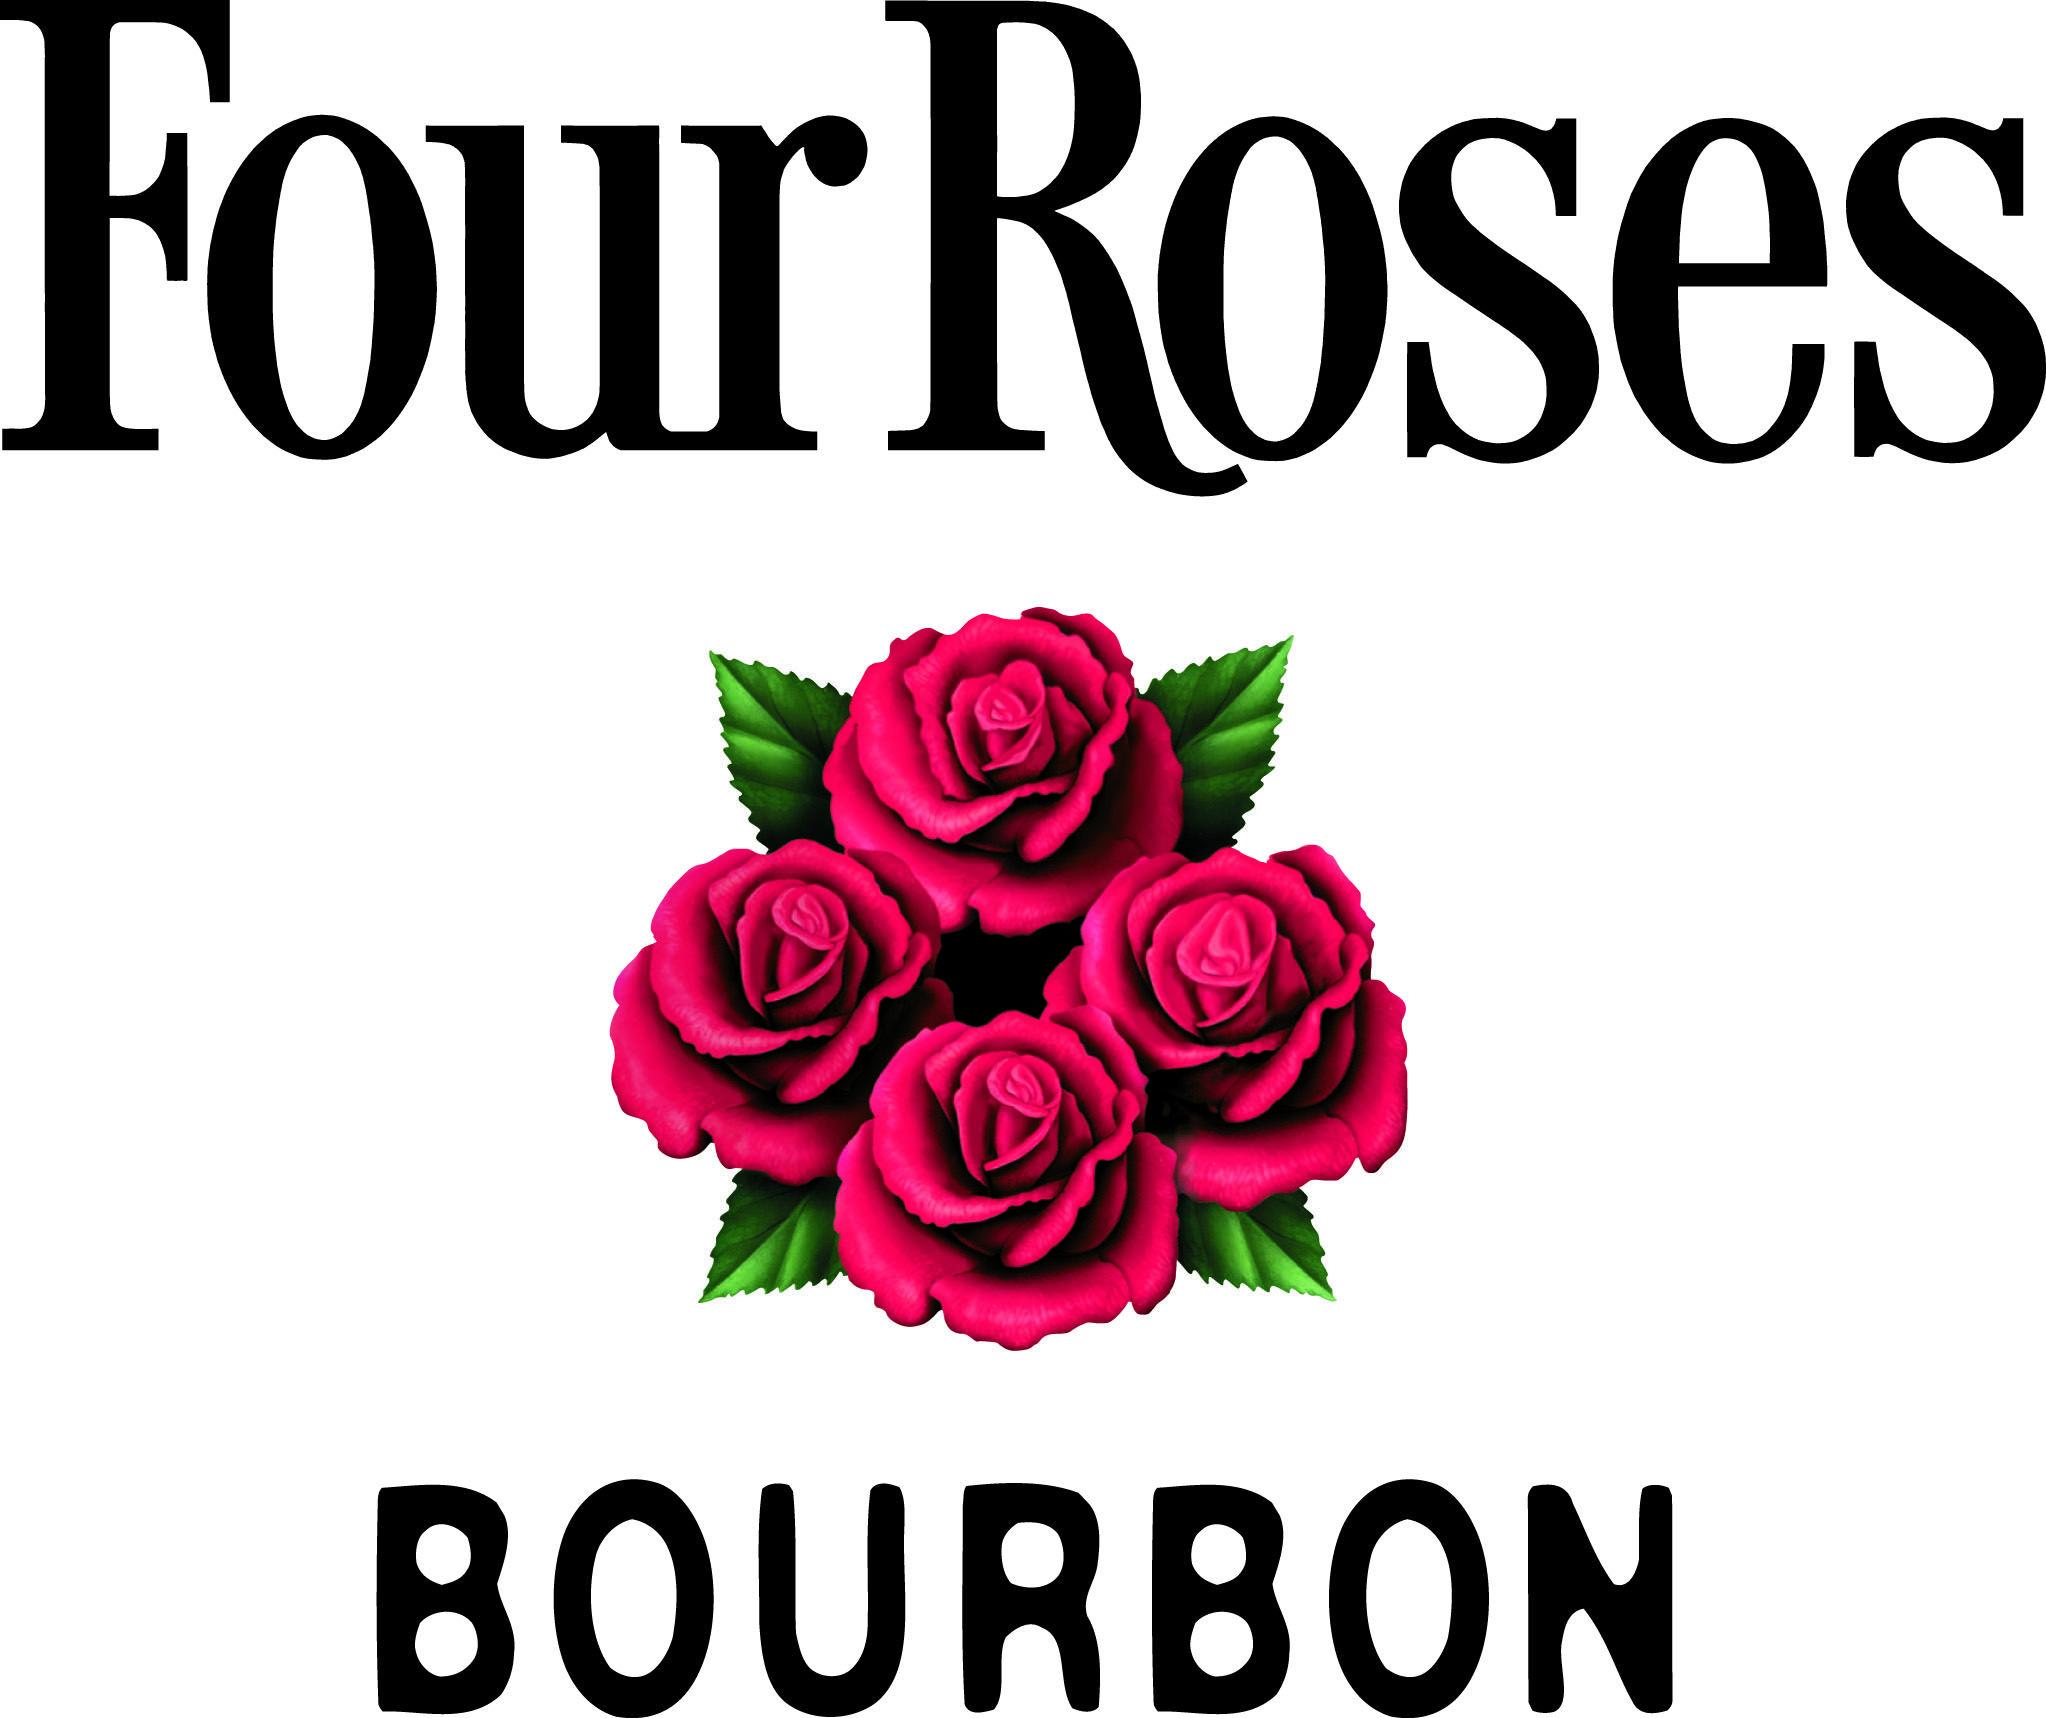 Four roses bourbon 2014 bronze sponsor four roses